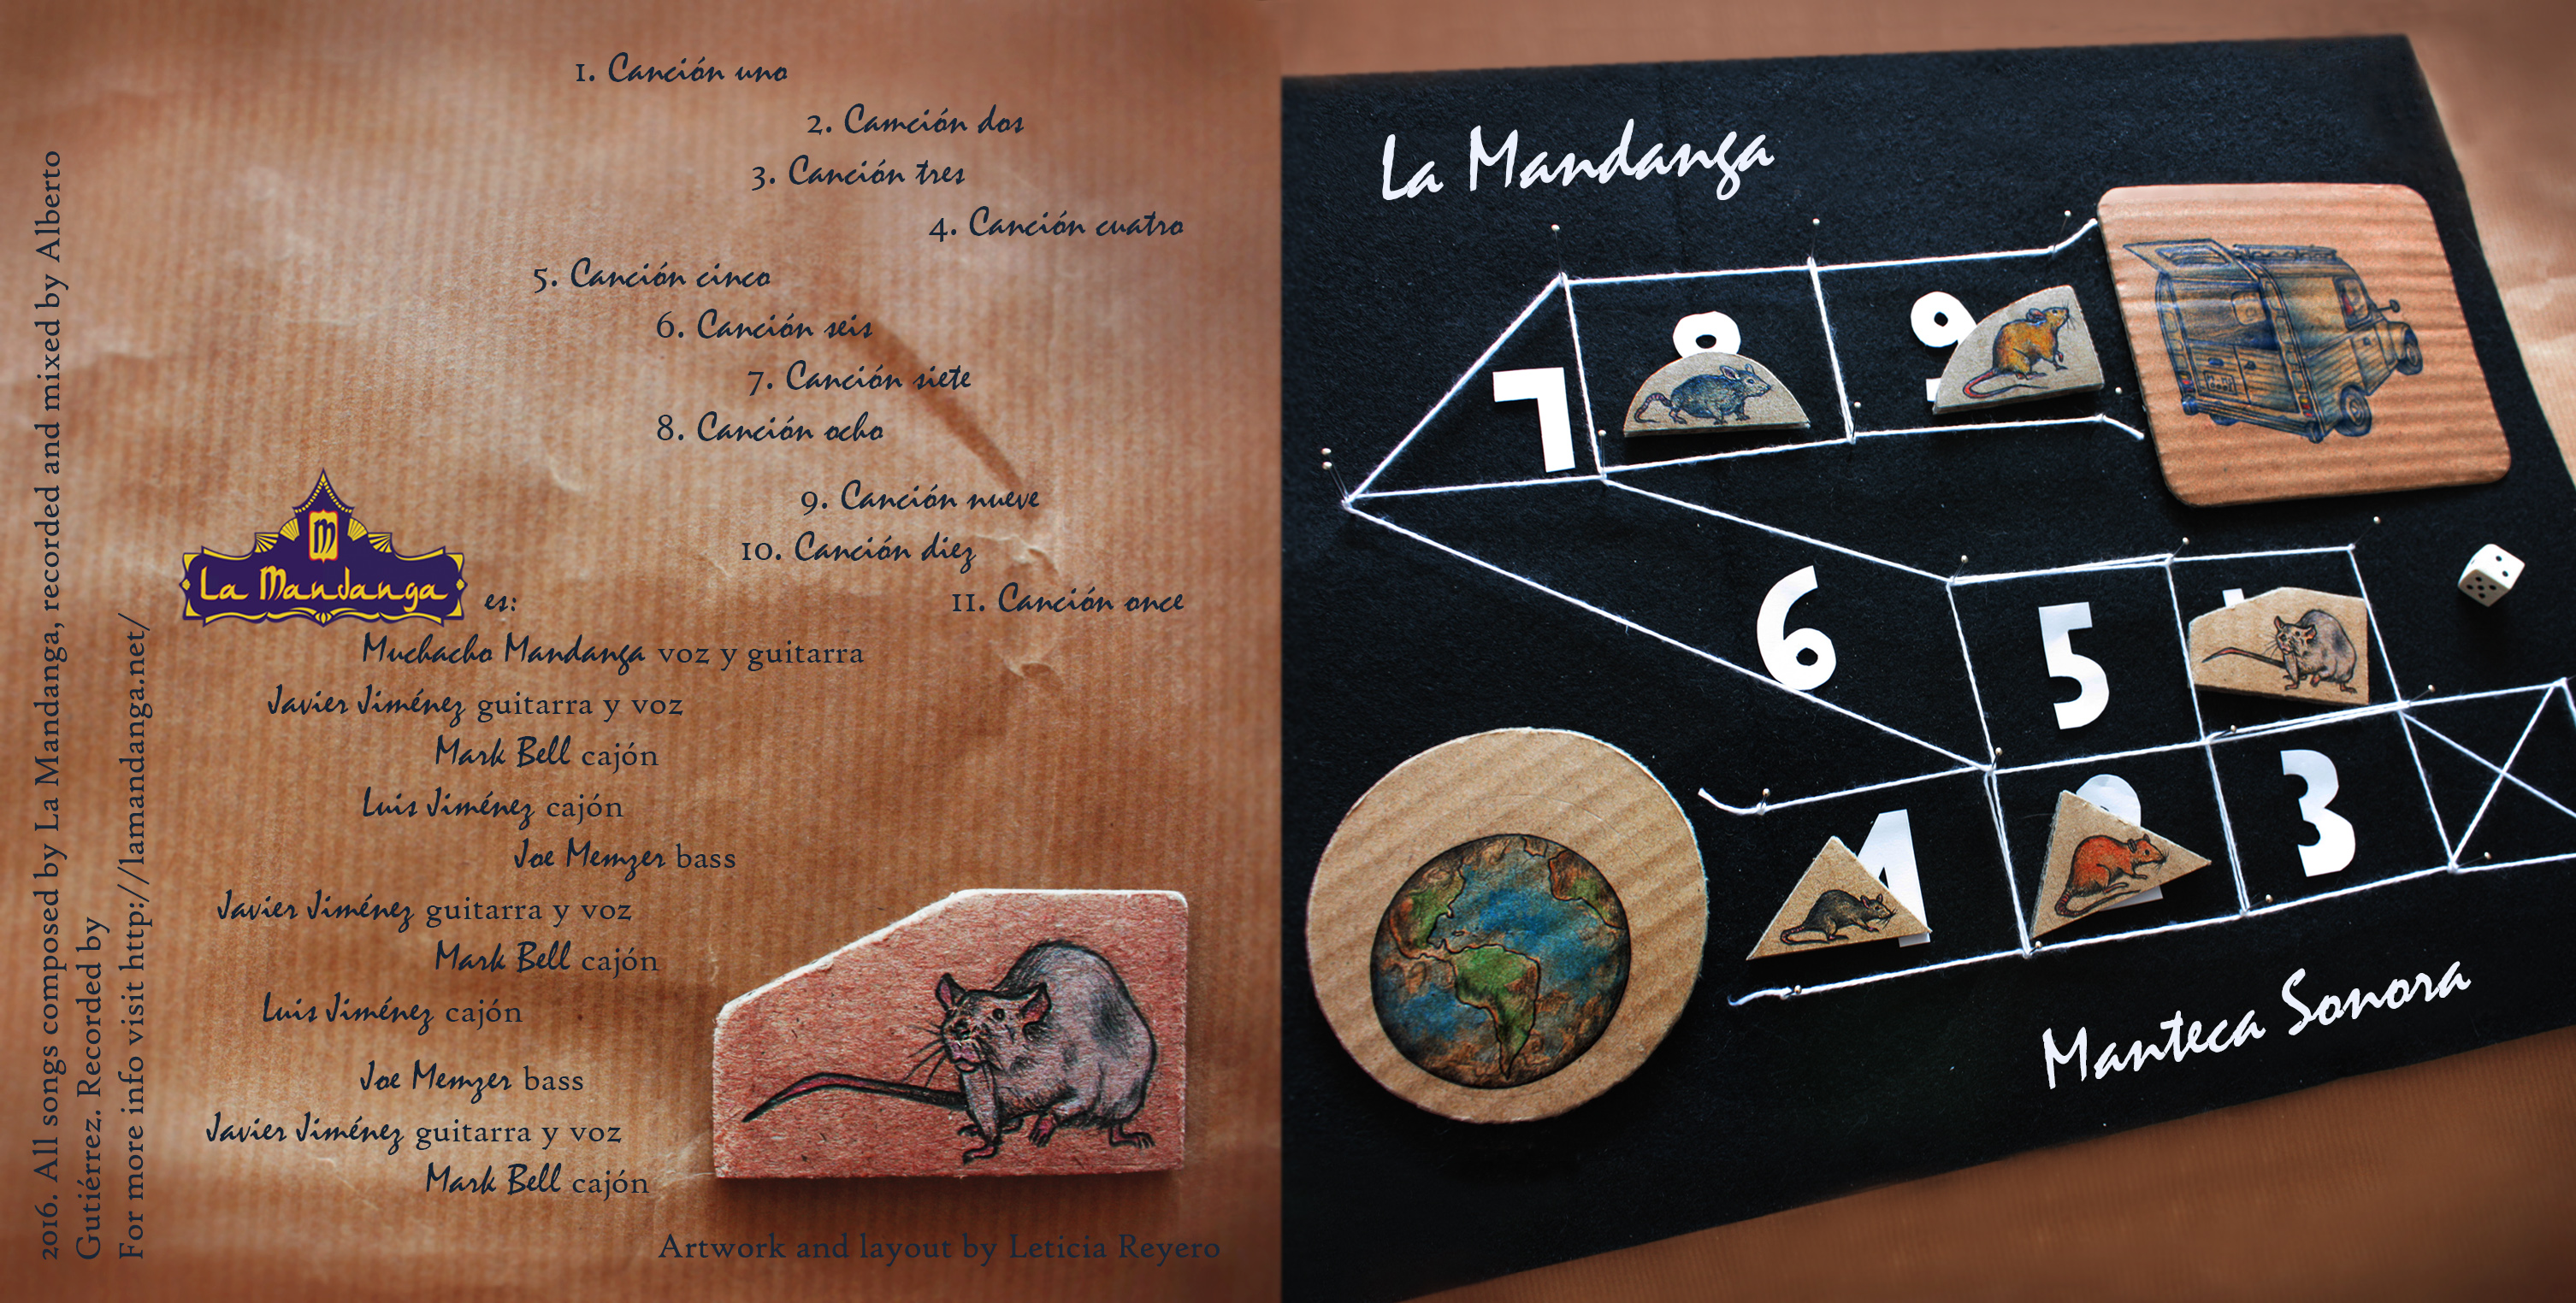 CD  Manteca Sonora